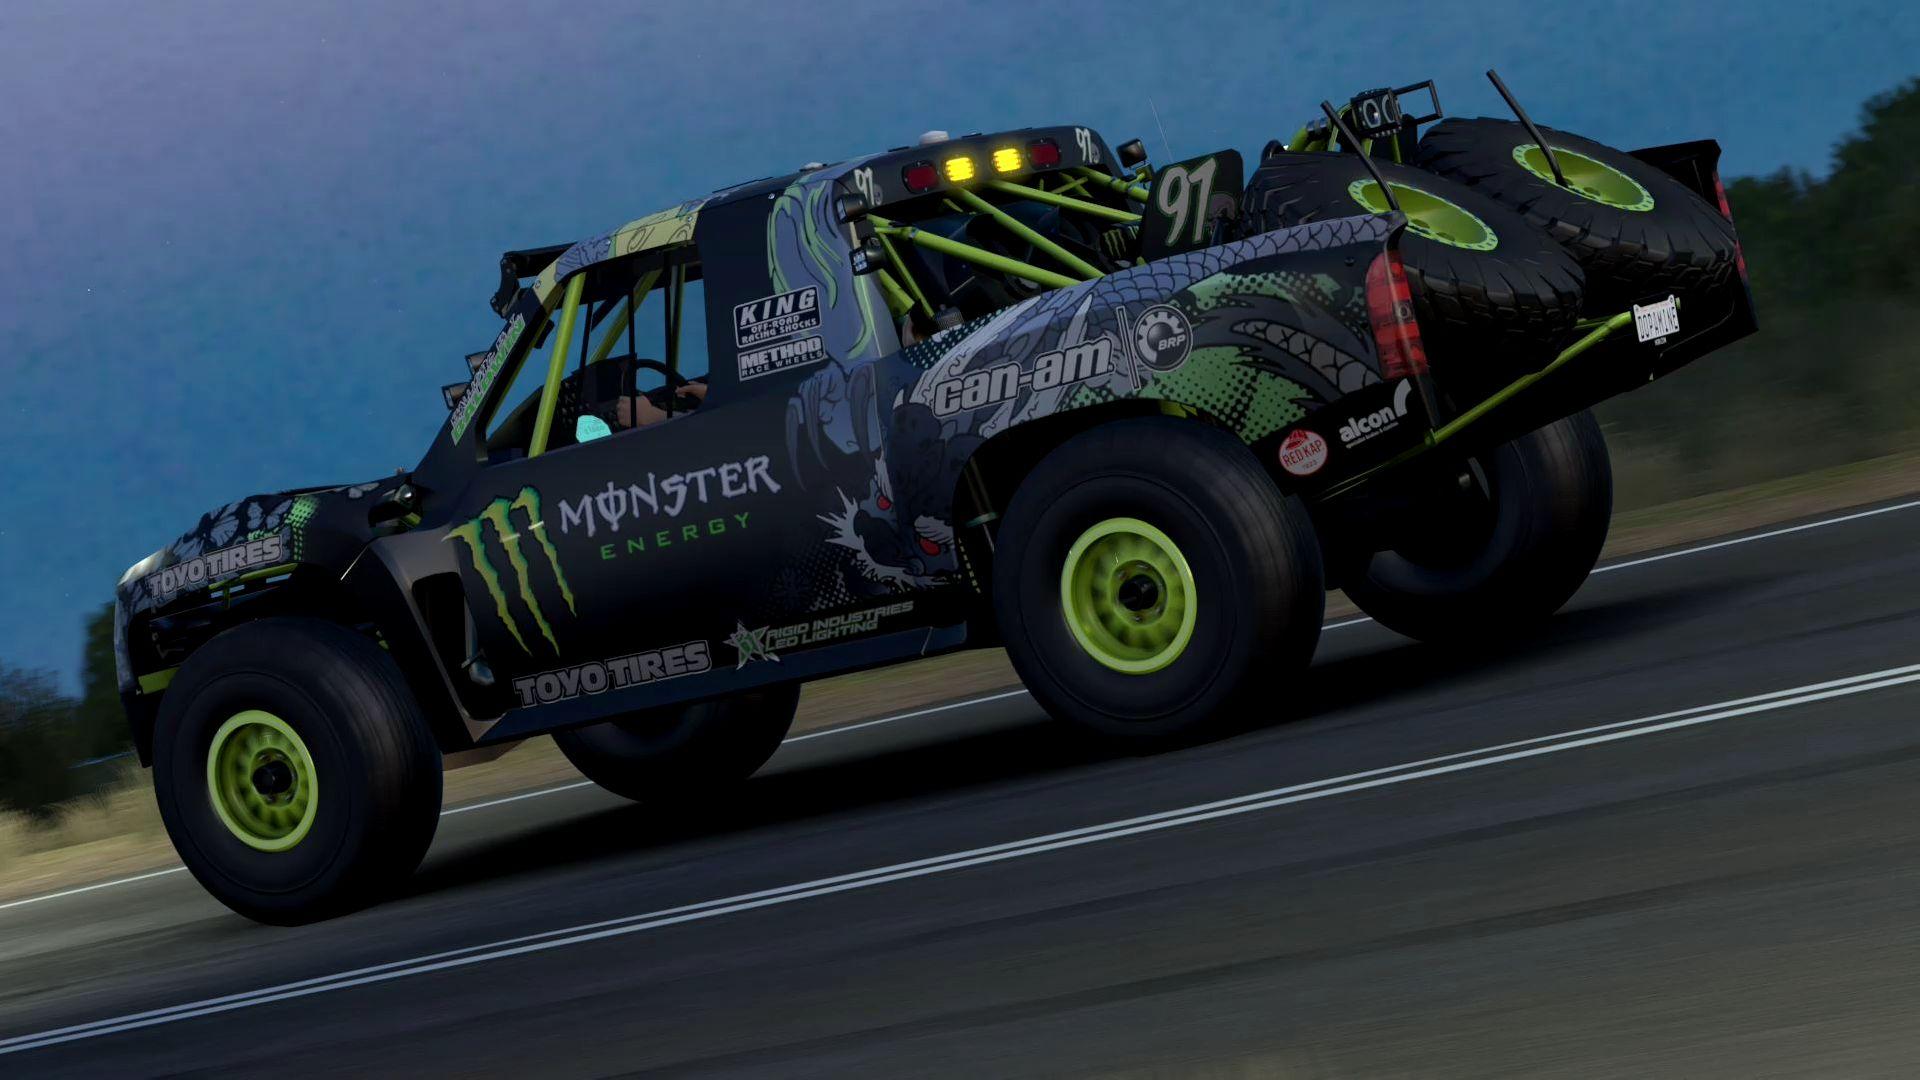 Hd Tune Up Cars Wallpaper 2015 Baldwin Motorsports 97 Monster Energy Trophy Truck